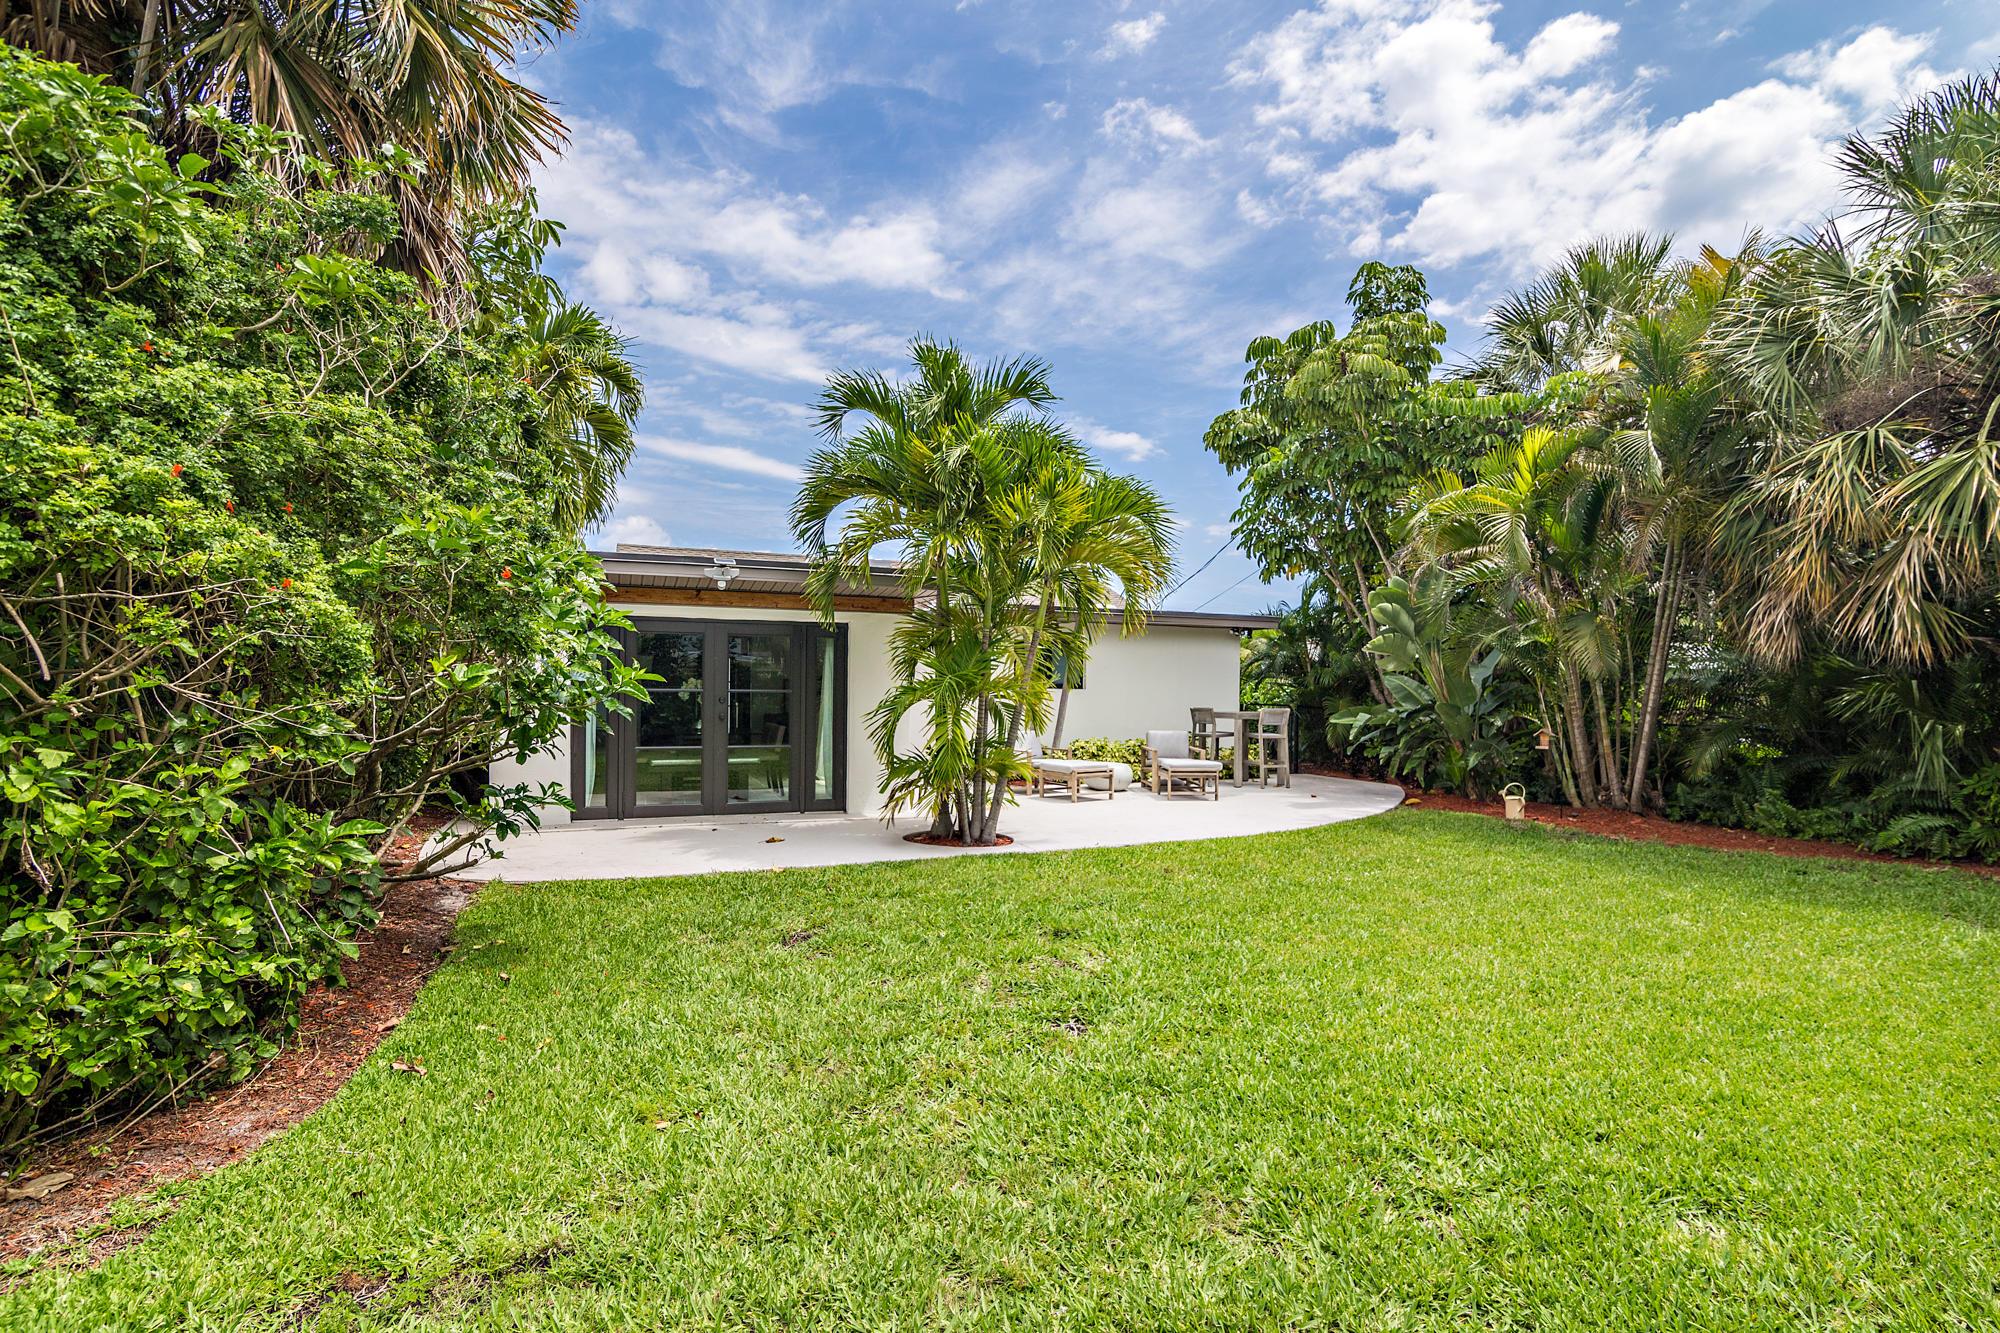 TOLEDO WEST PALM BEACH FLORIDA